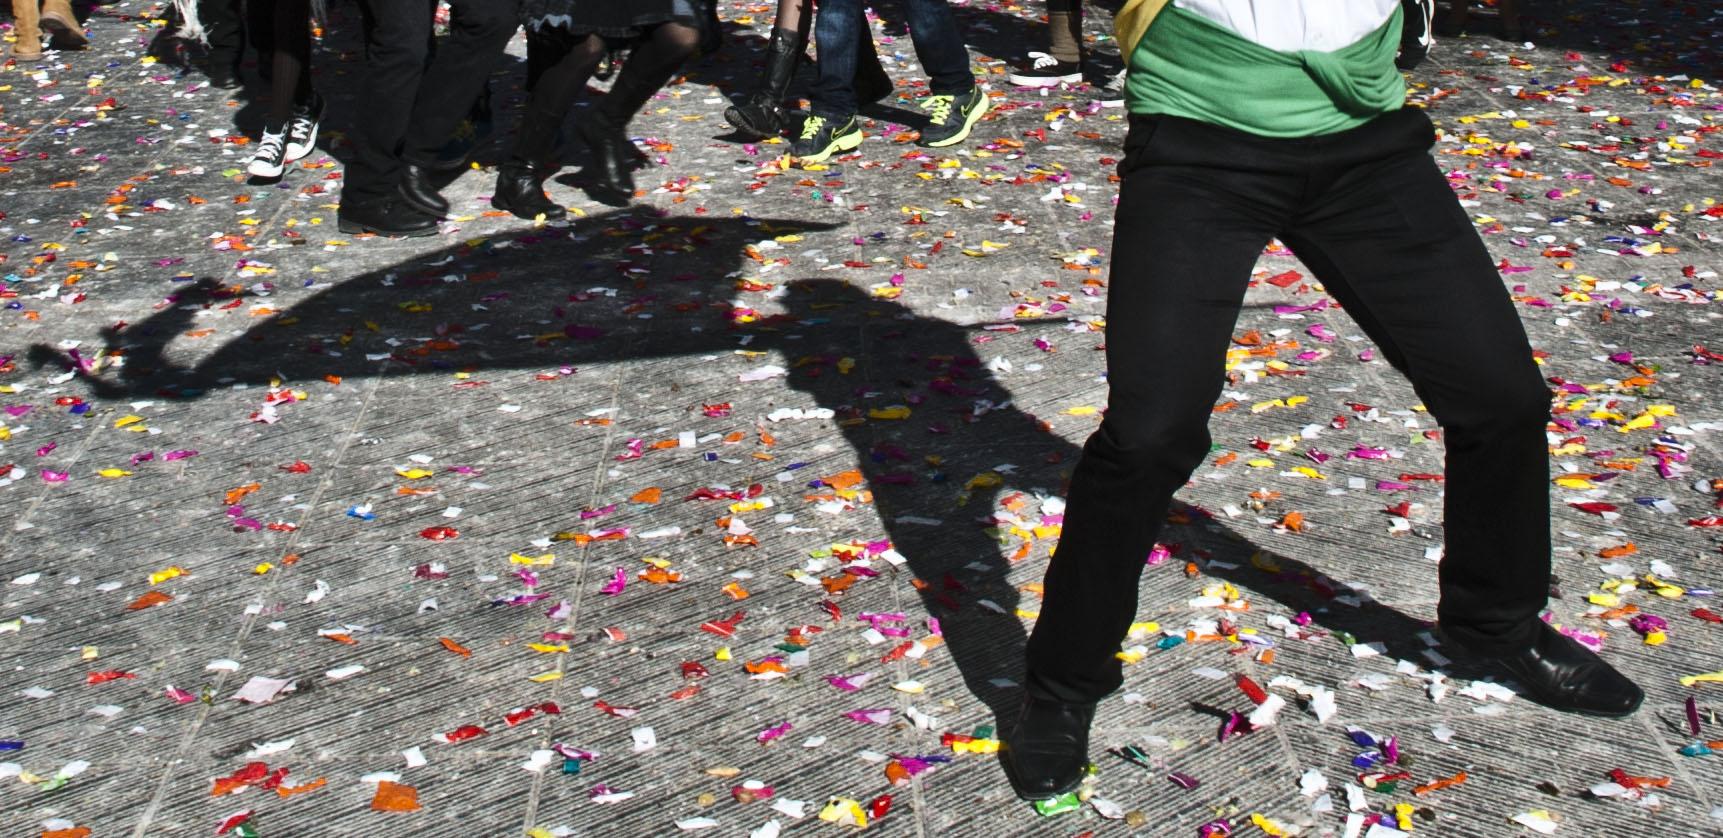 Fiesta de Carnaval en Vilanova i la Geltru